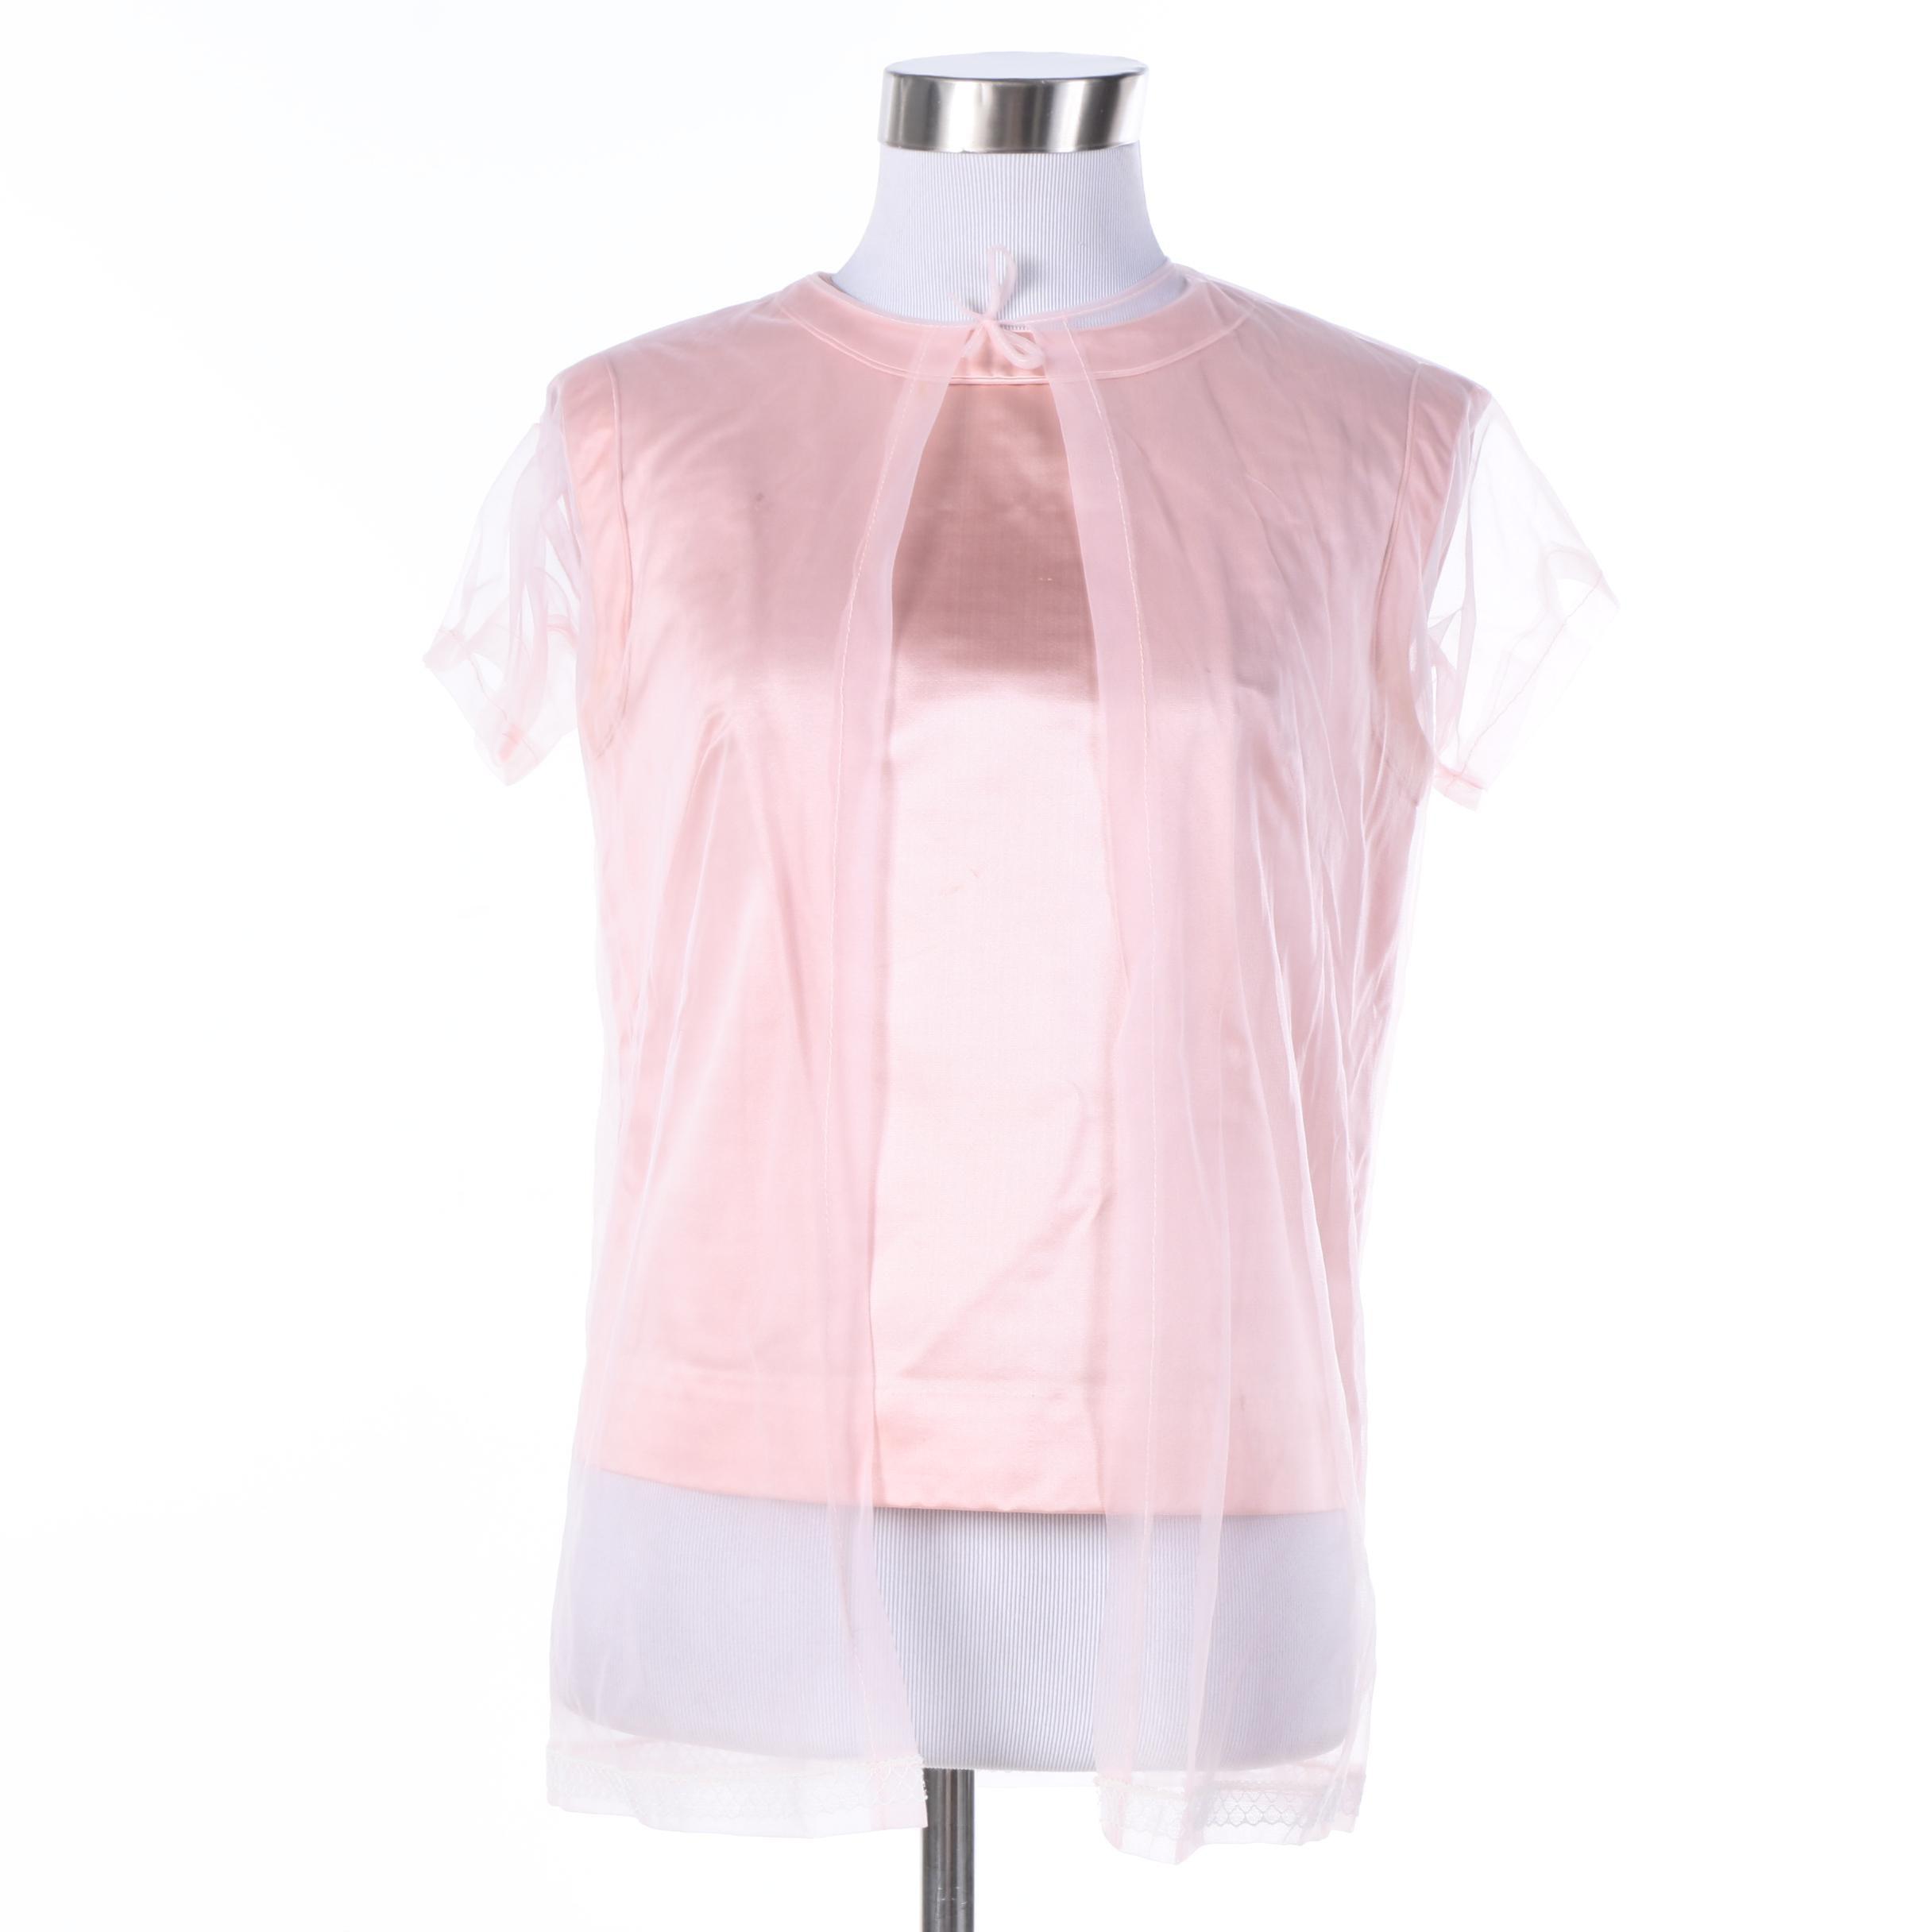 Circa 1960s Vintage Royal Lynne Pink Satin Shirt and Nylon Jacket